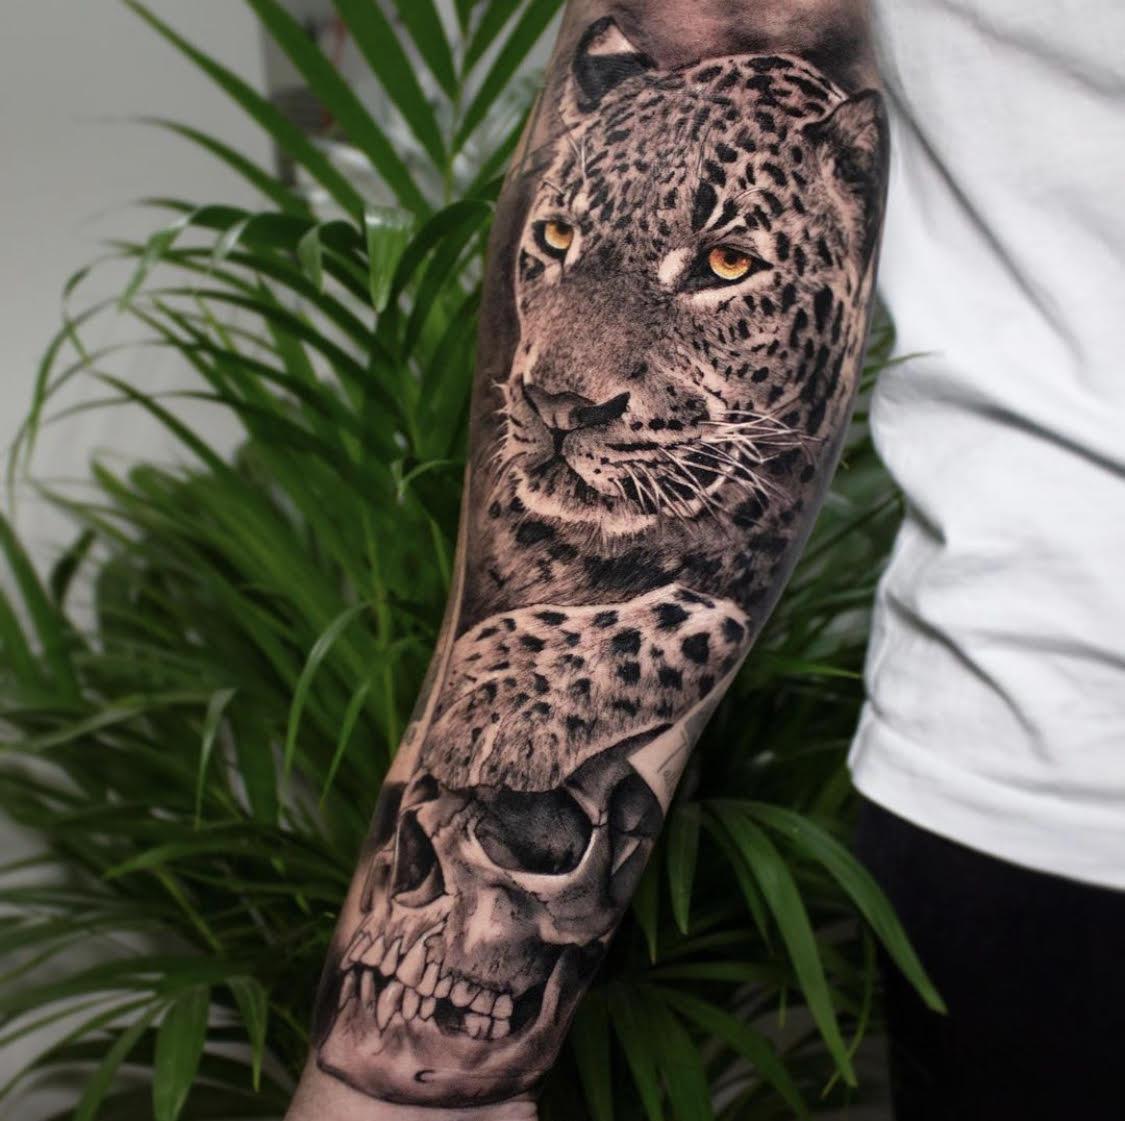 Ruben Ruiz, Inksession Tattoo, Malaga, Spain